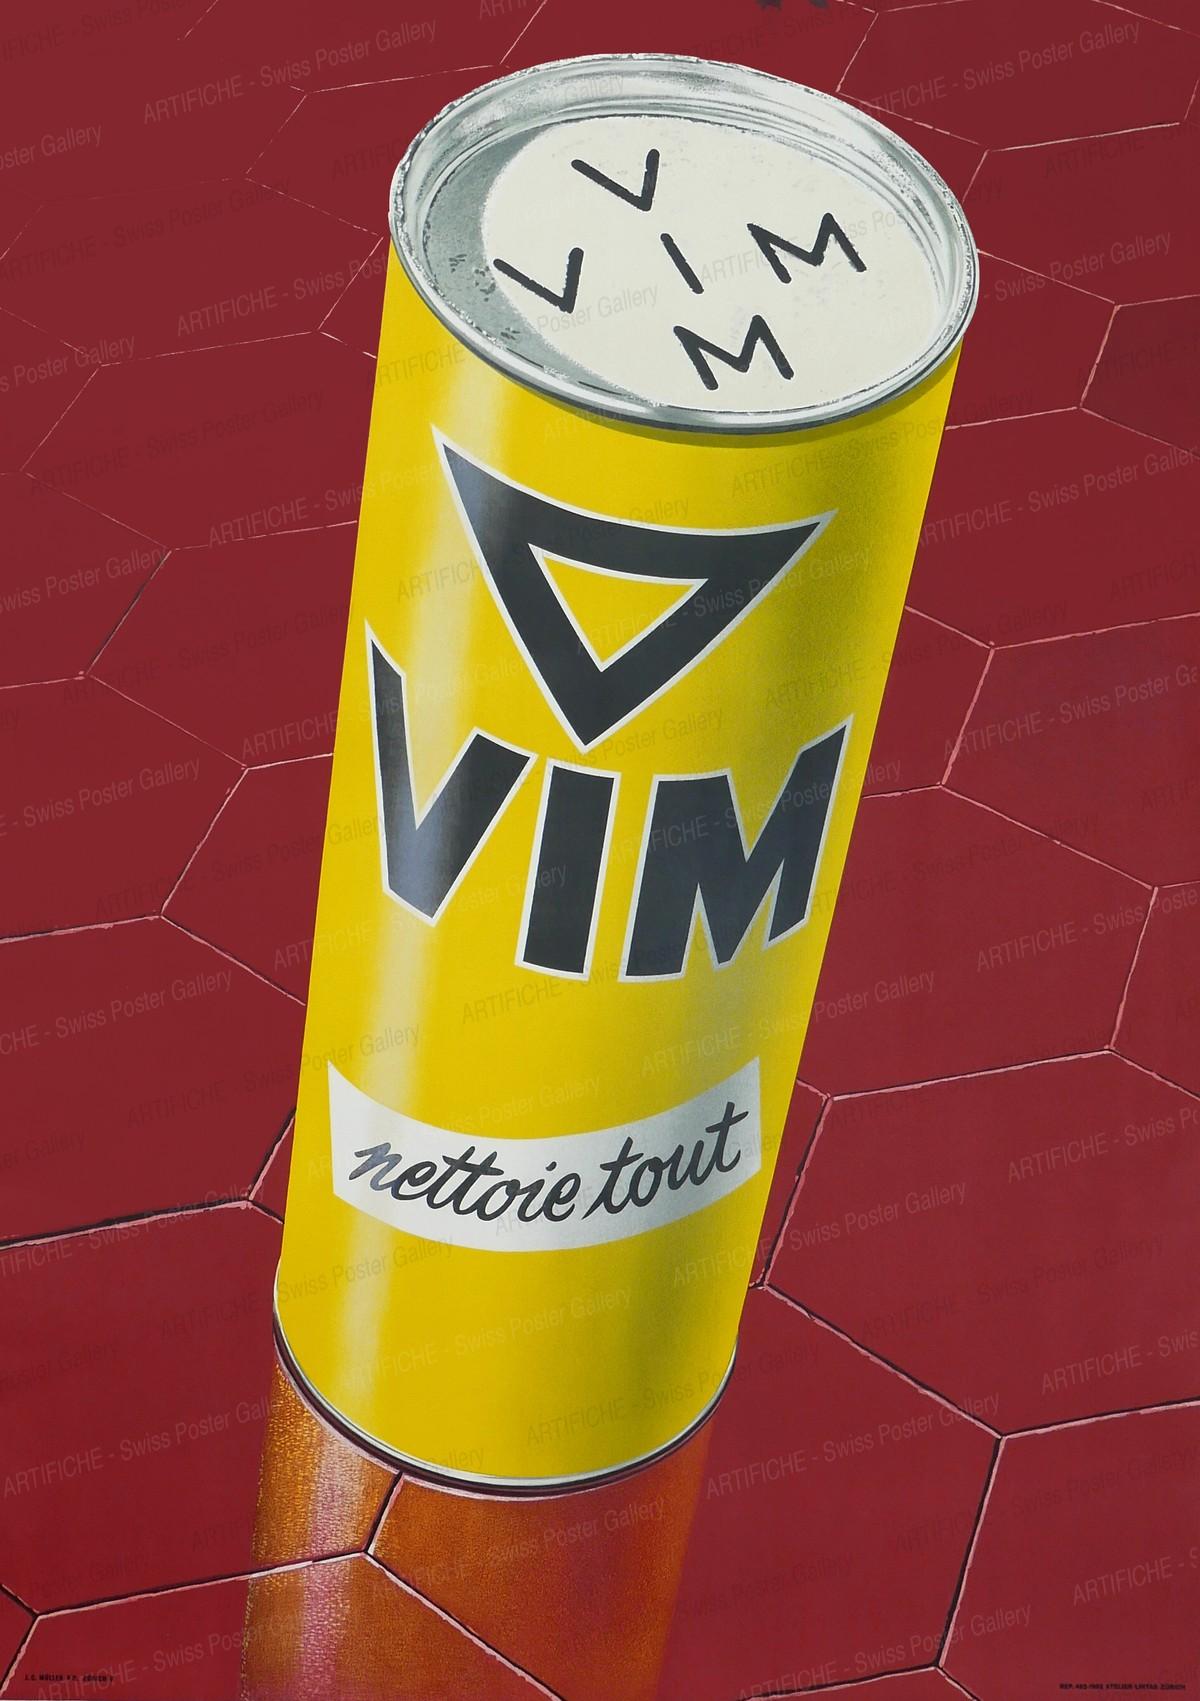 VIM nettoie tout, Lintas